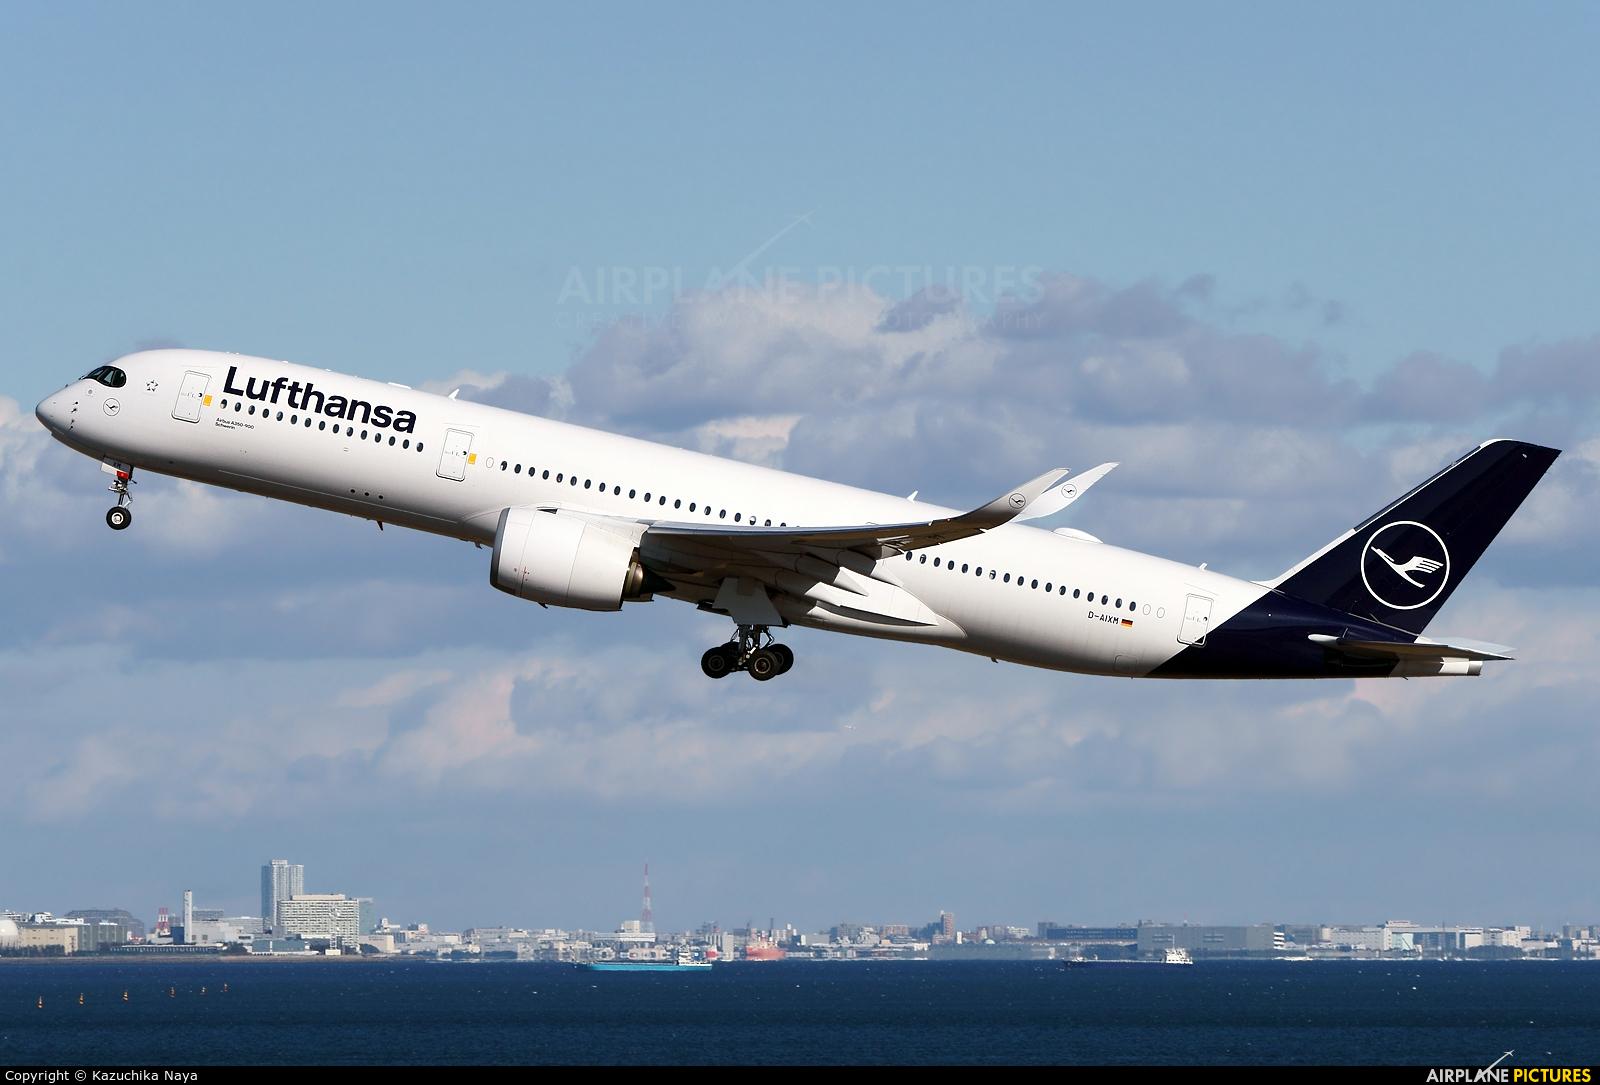 Lufthansa D-AIXM aircraft at Tokyo - Haneda Intl